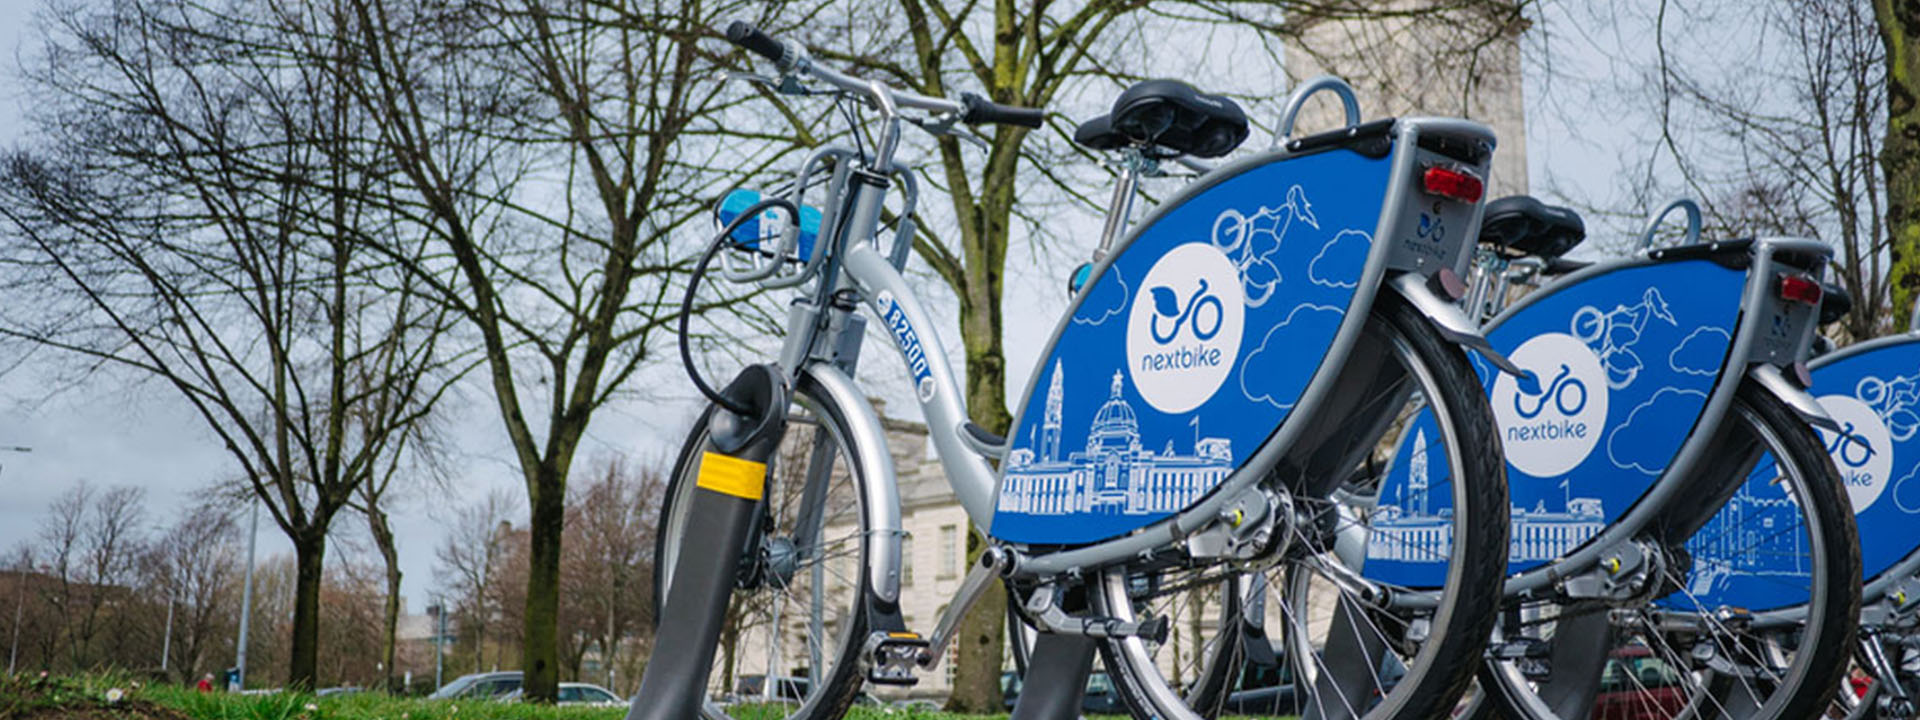 NHS introduce Prescription Bike sharing scheme to beat heart disease.